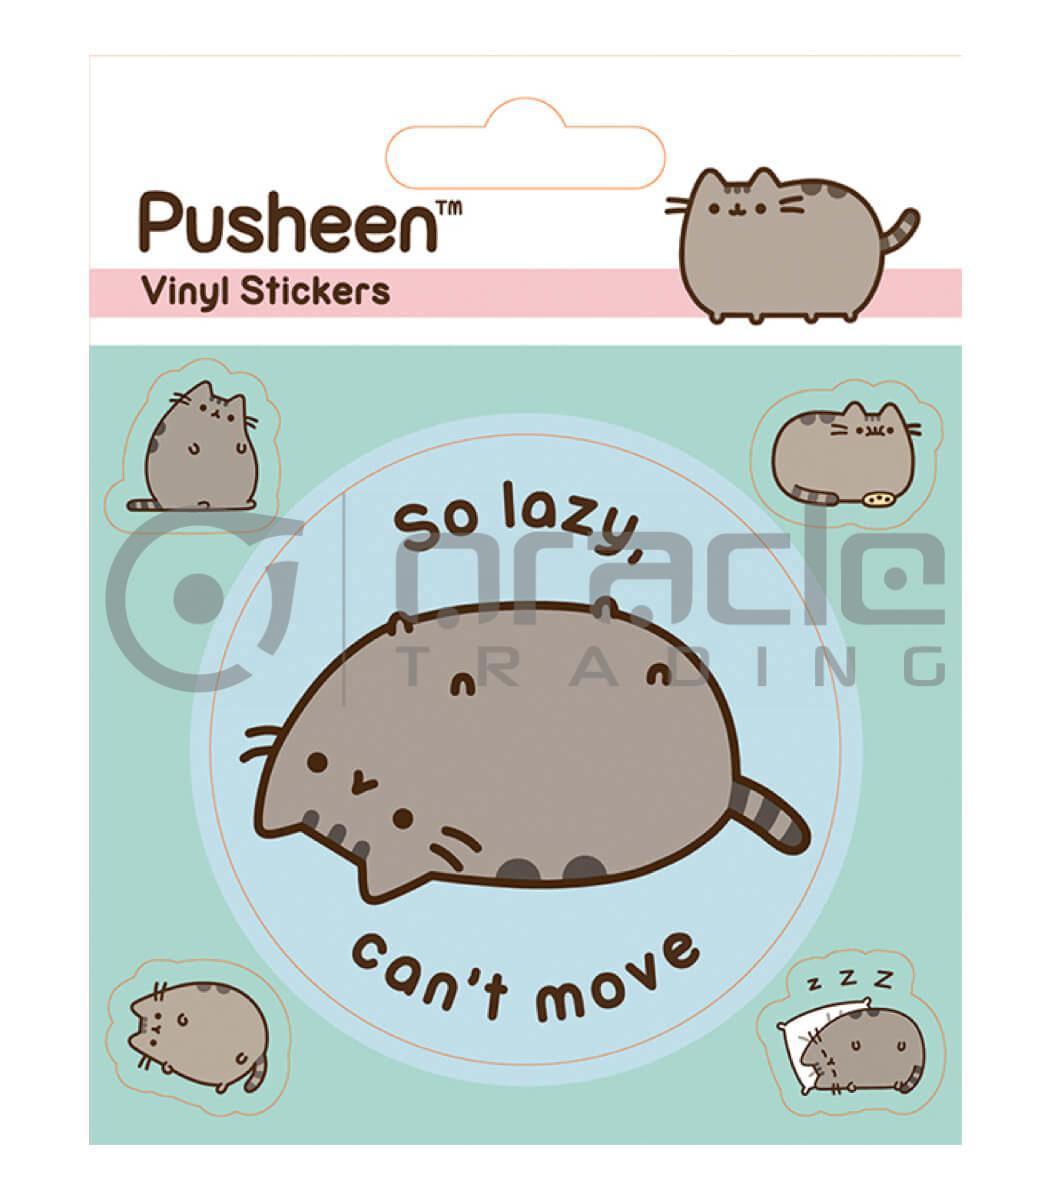 Pusheen Vinyl Sticker Pack